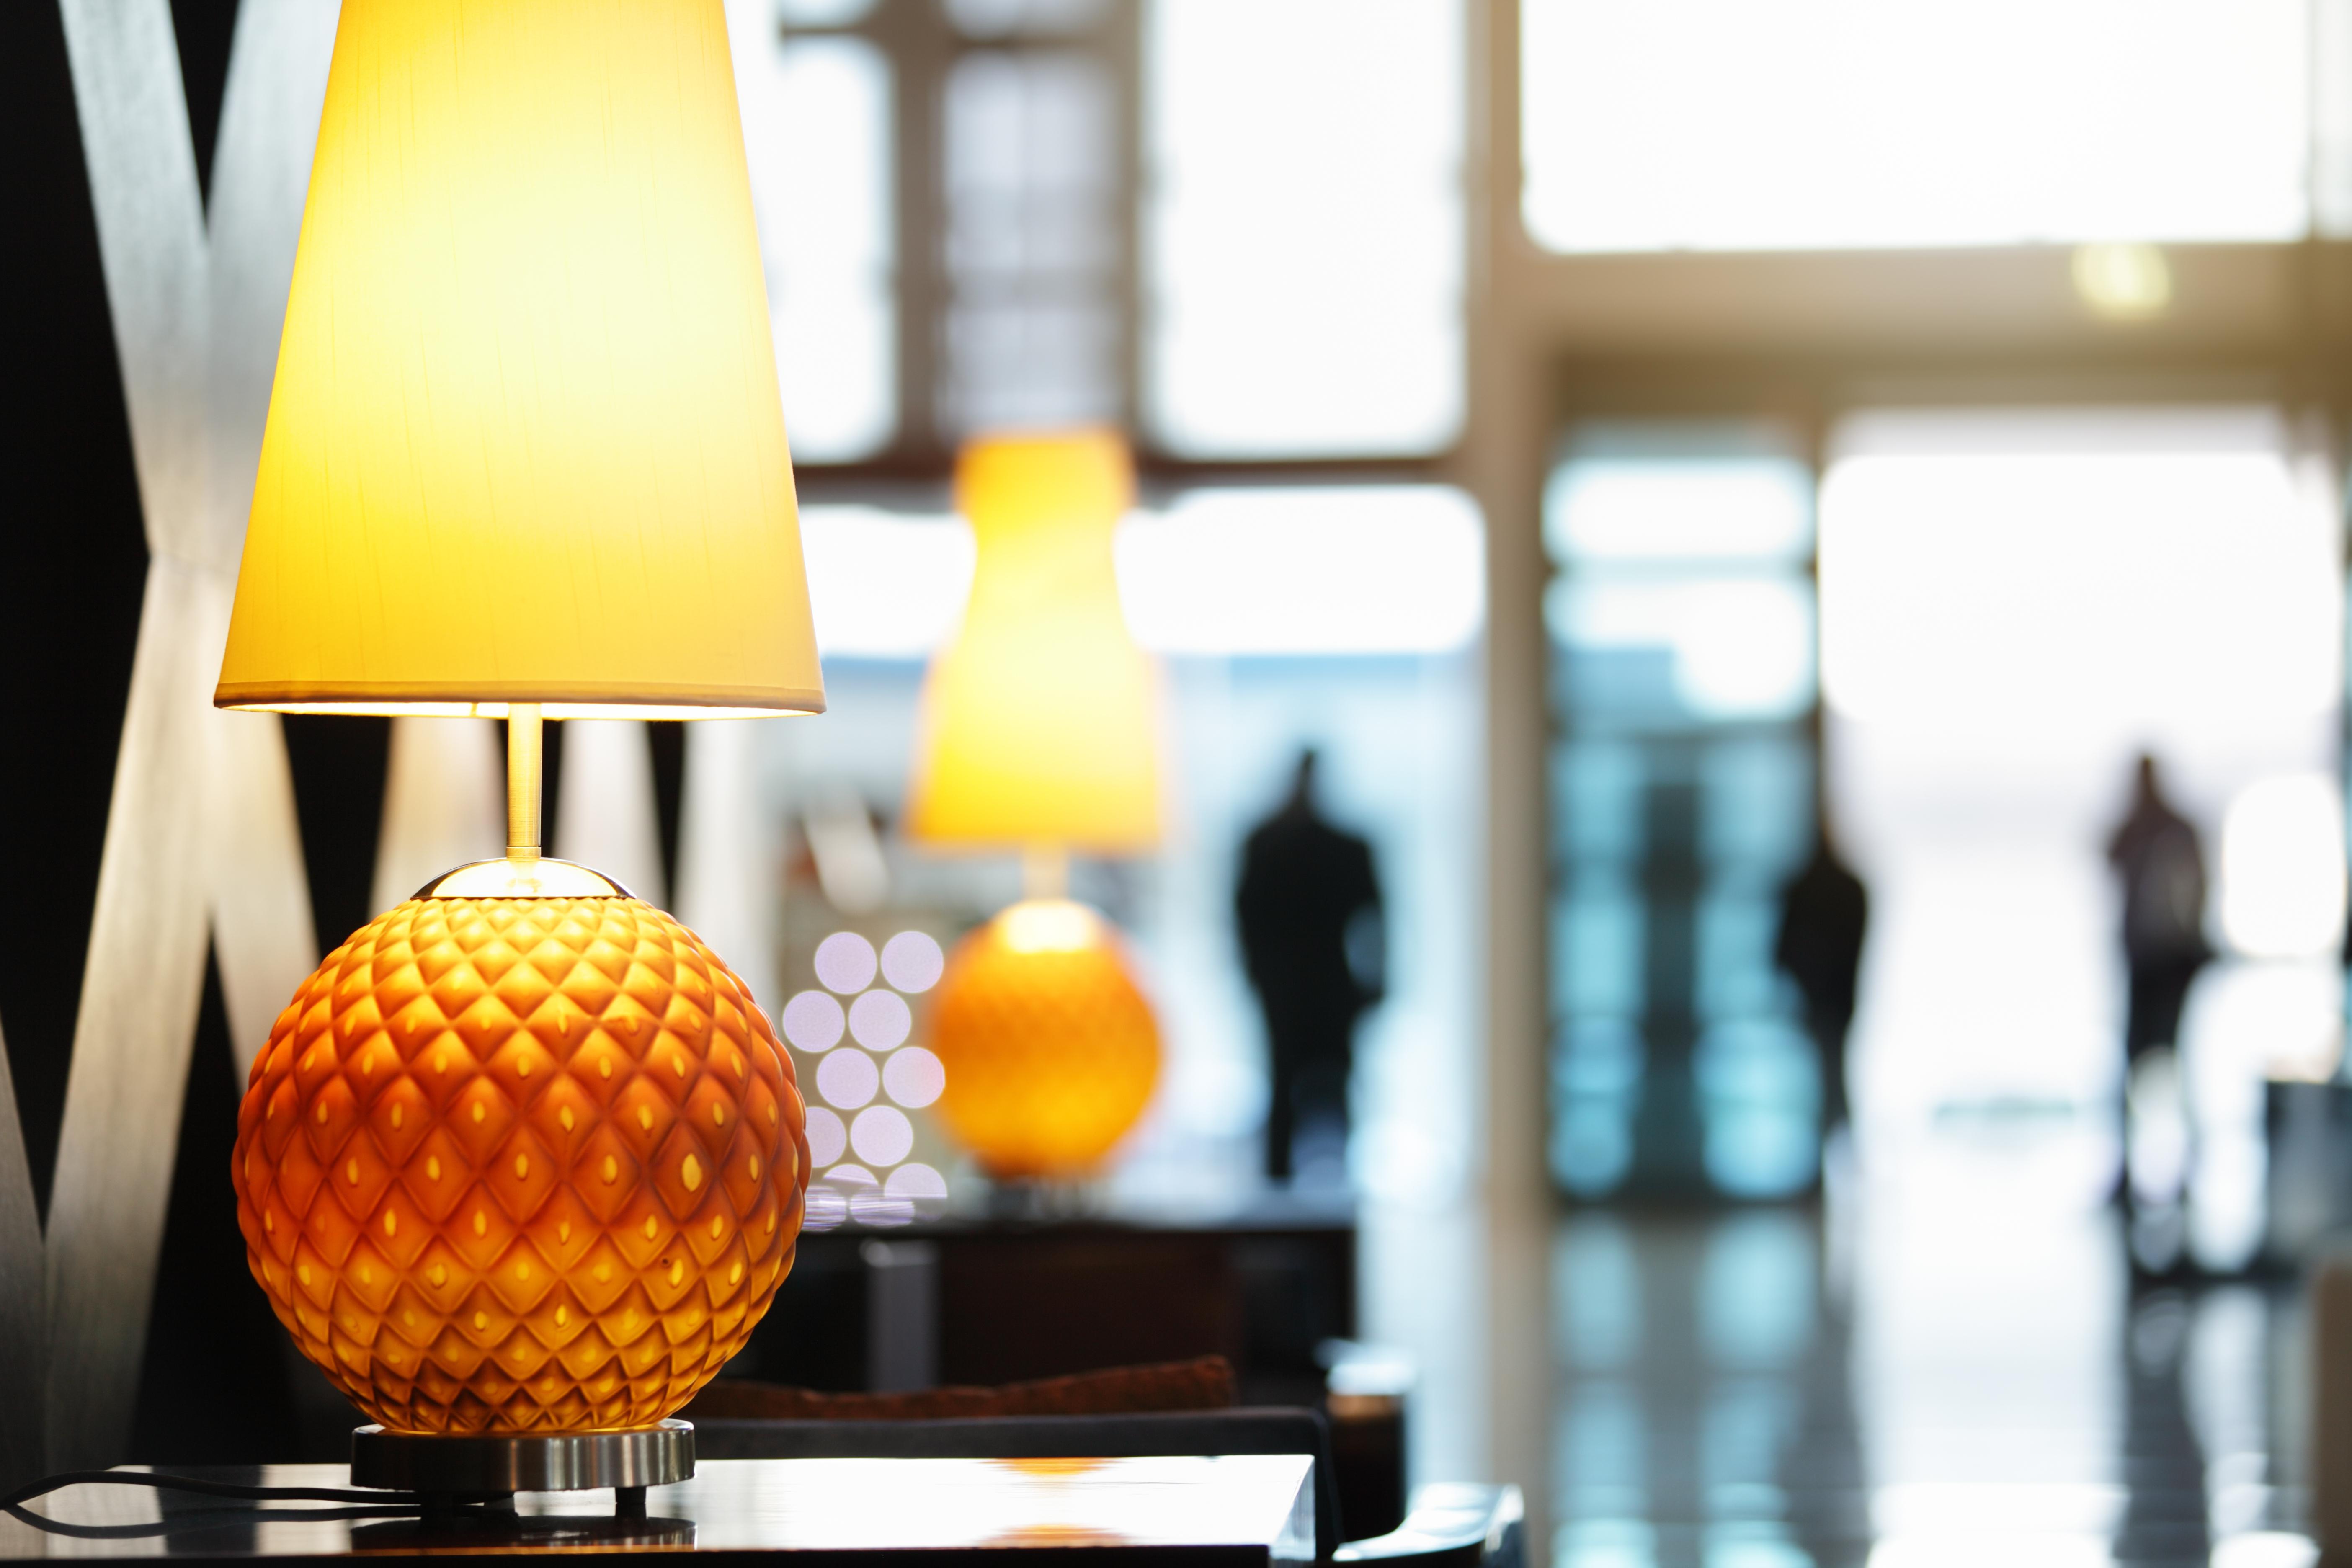 7 Luxury hotel openings to look forward to in 2016